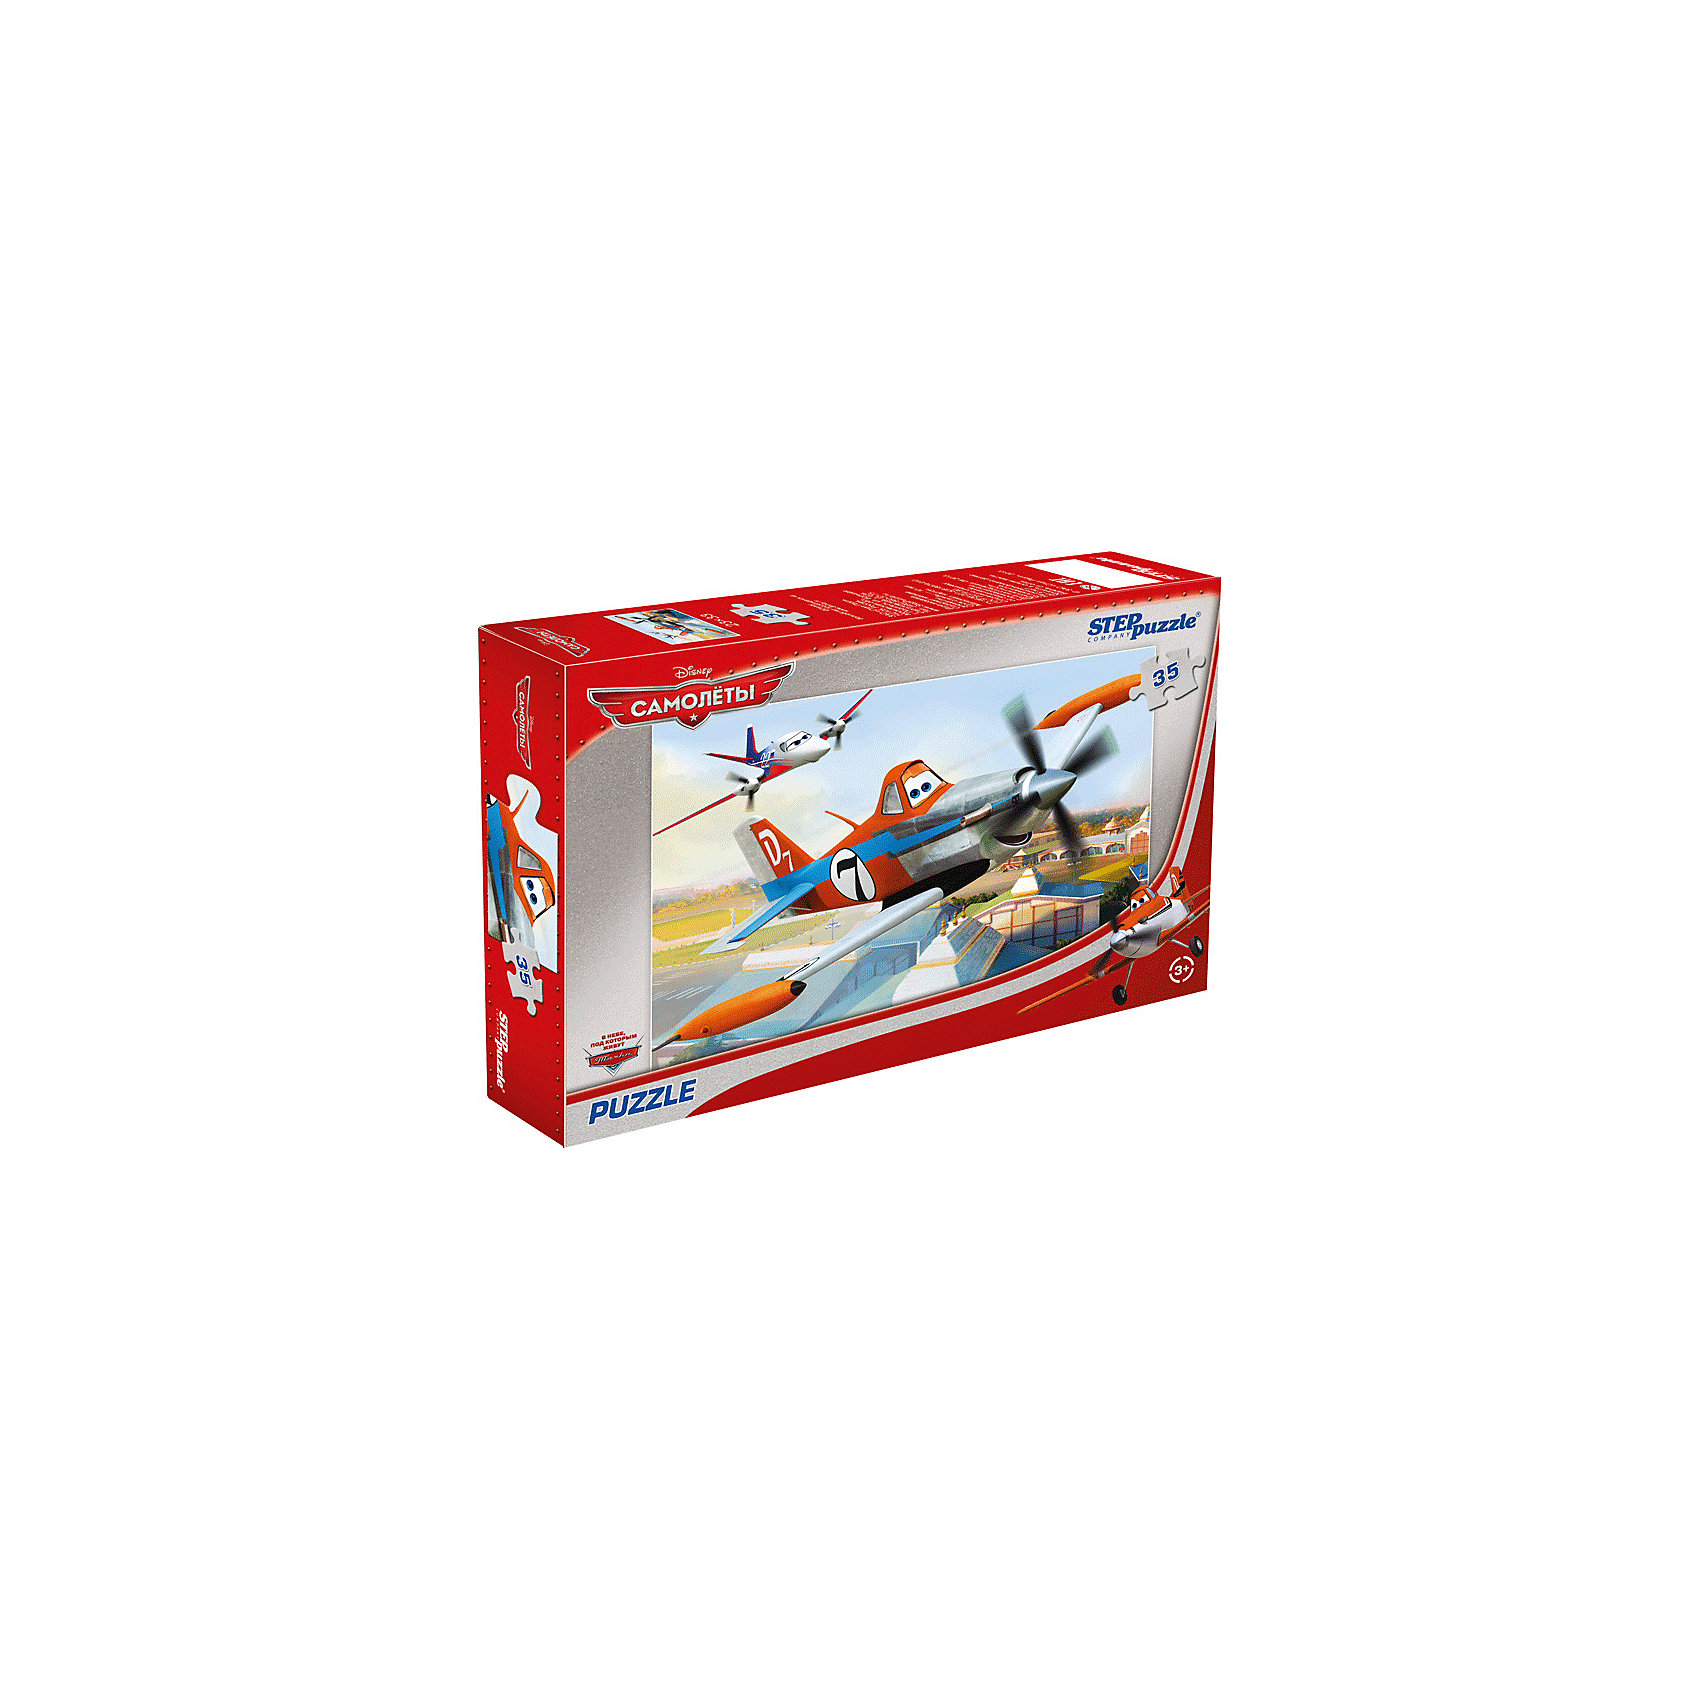 Степ Пазл Пазл Самолеты, 35 деталей, Step Puzzle trefl детский пазл дасти в небесах 160 деталей самолеты 2